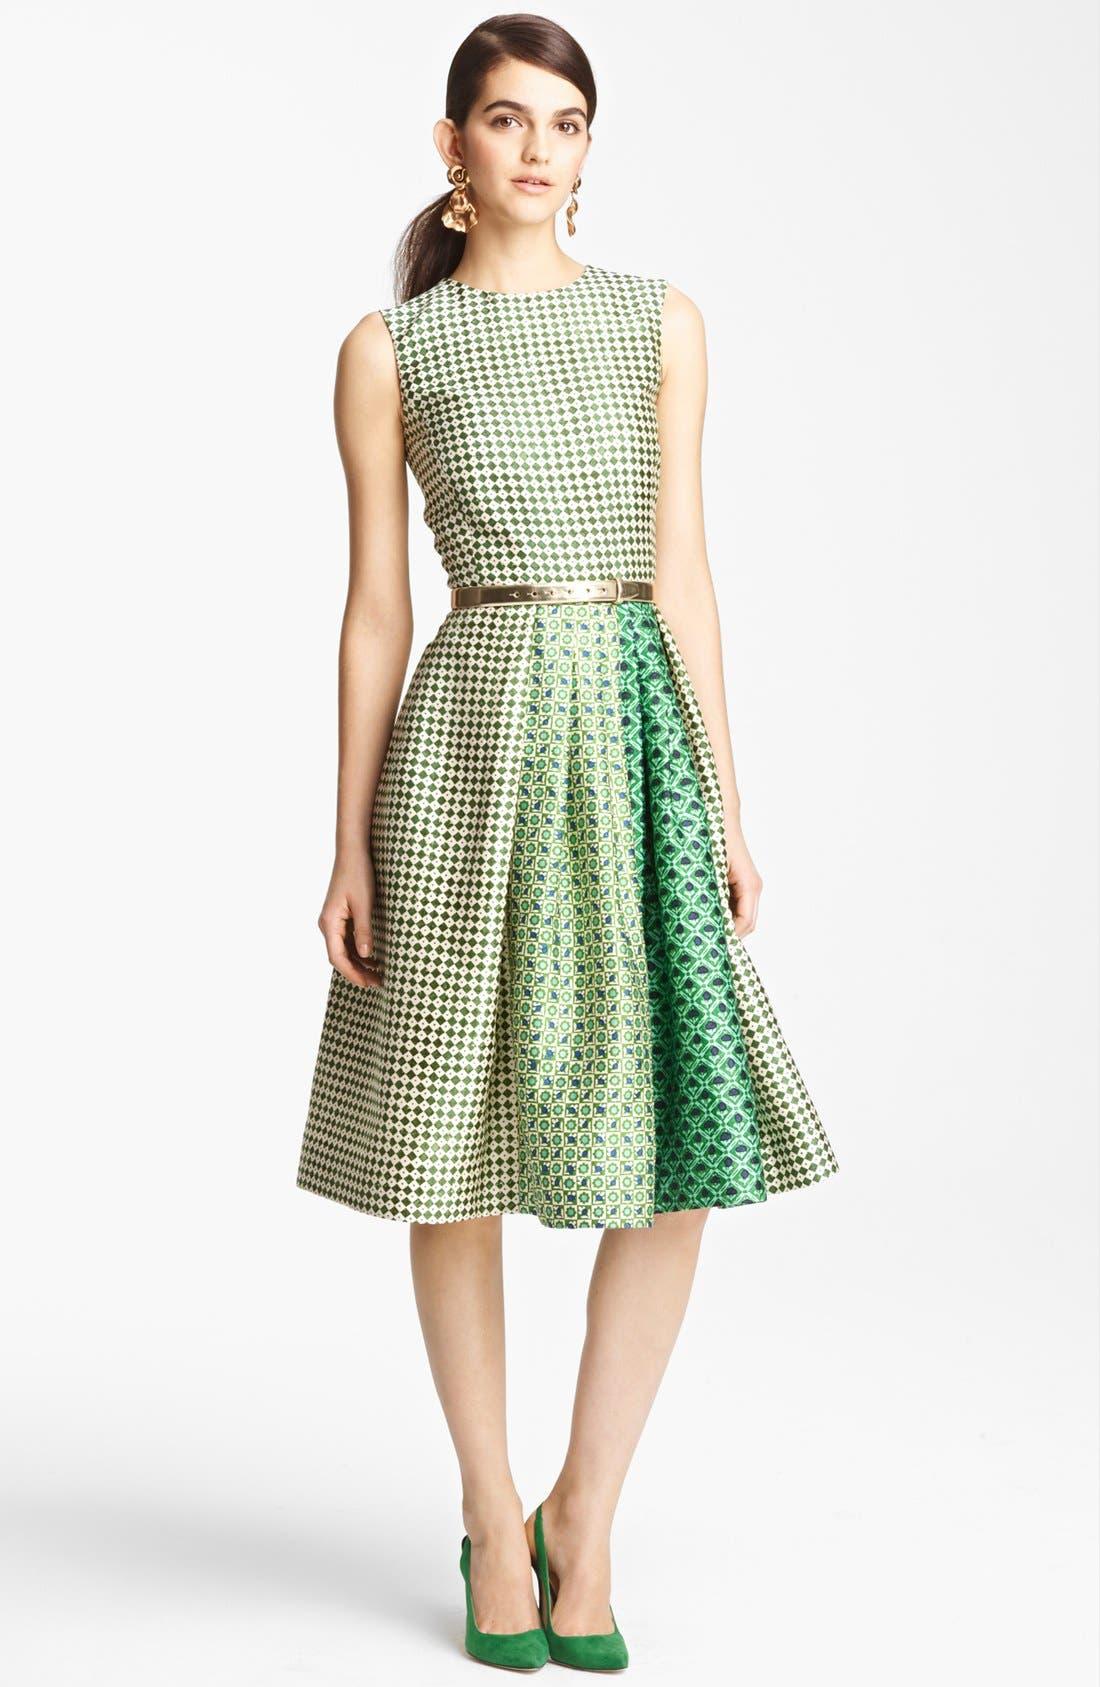 Main Image - Oscar de la Renta Print Full Skirt Dress